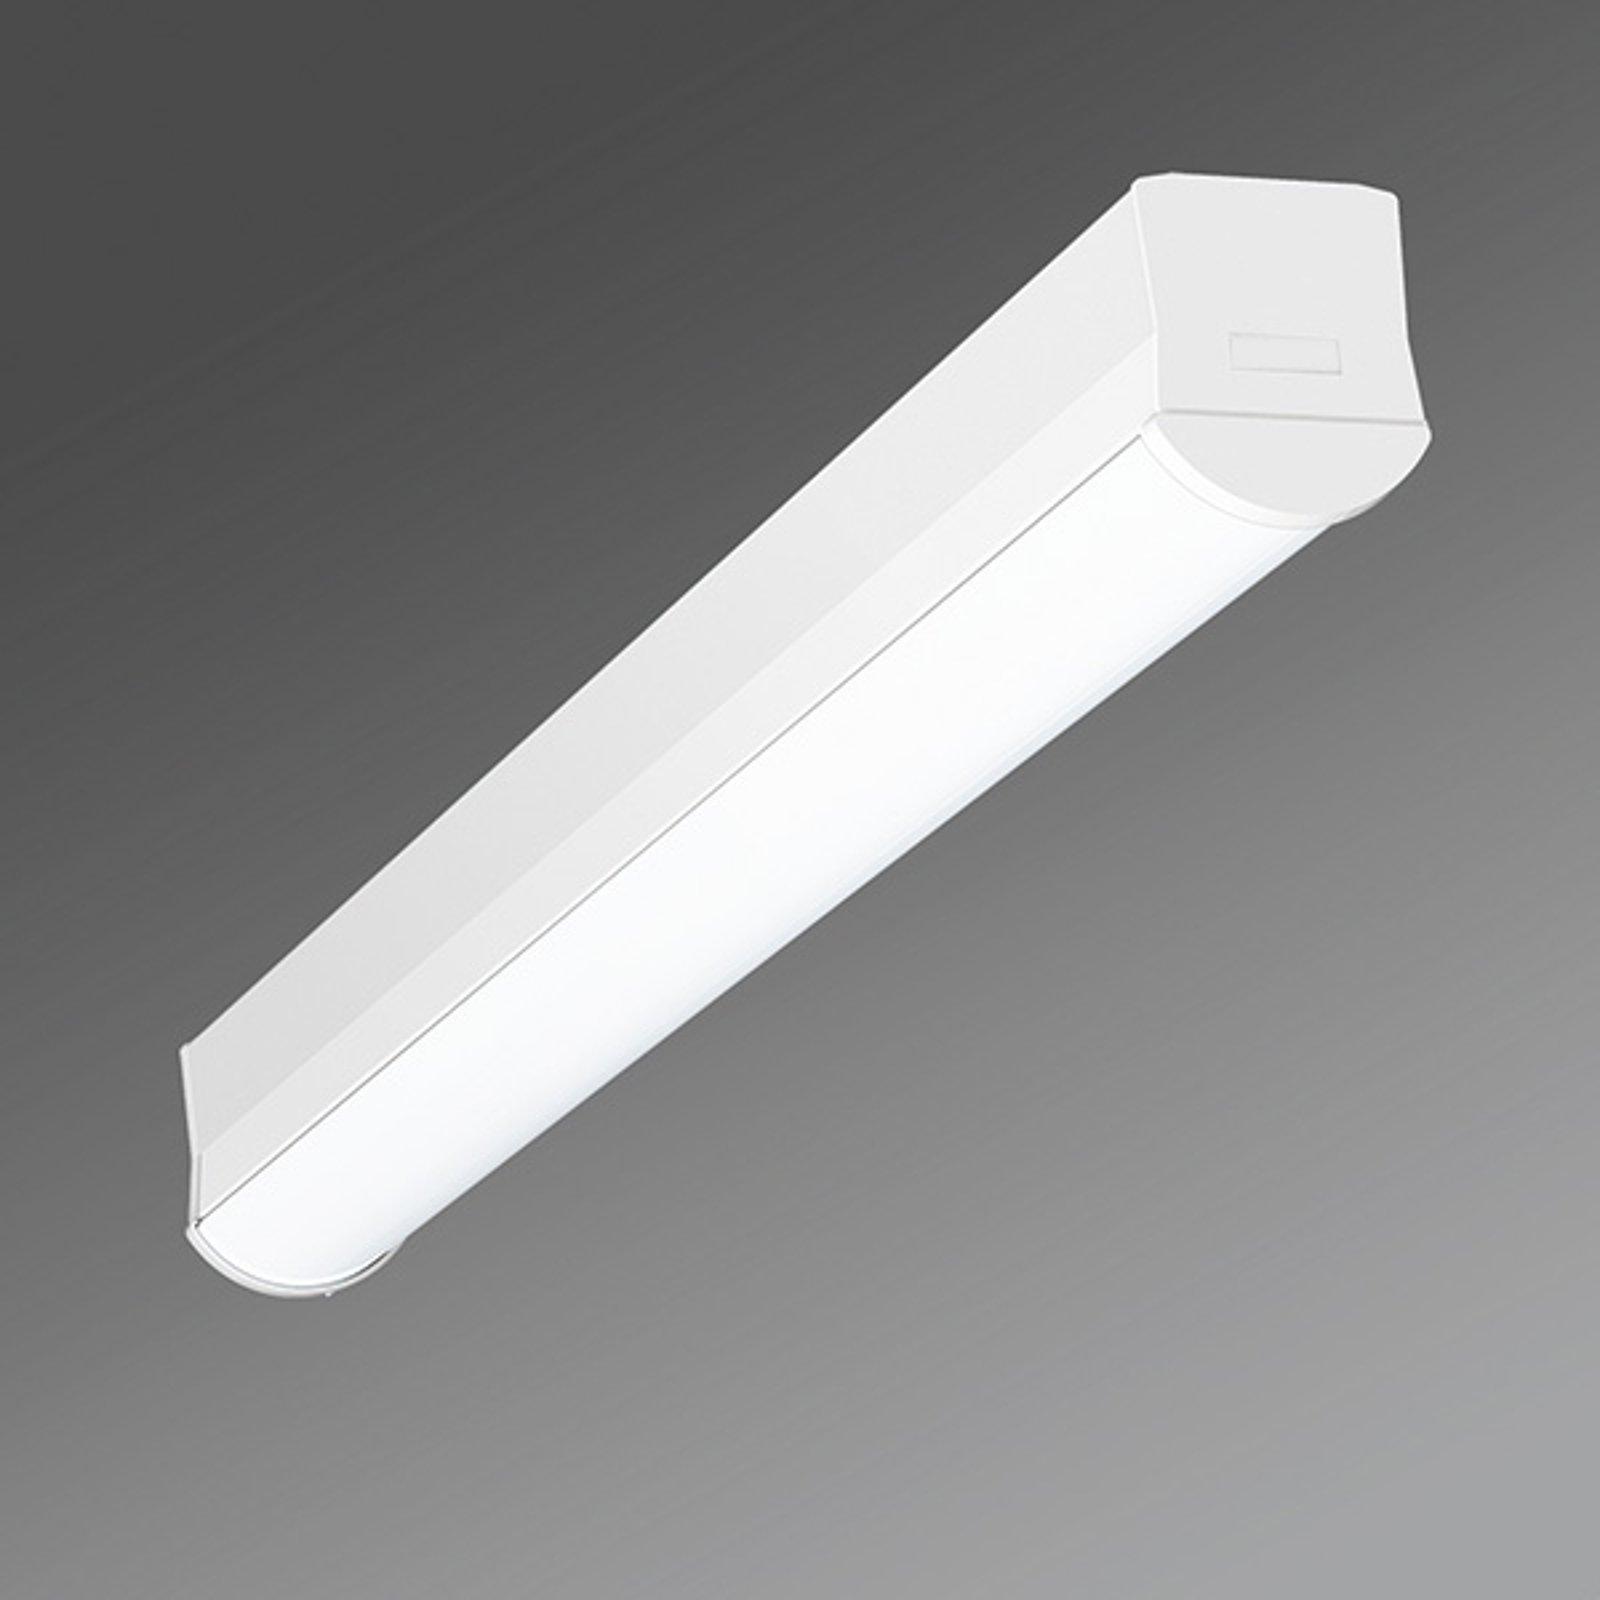 Smal LED-taklampe med Ilia-ILG/0600 4 000 K